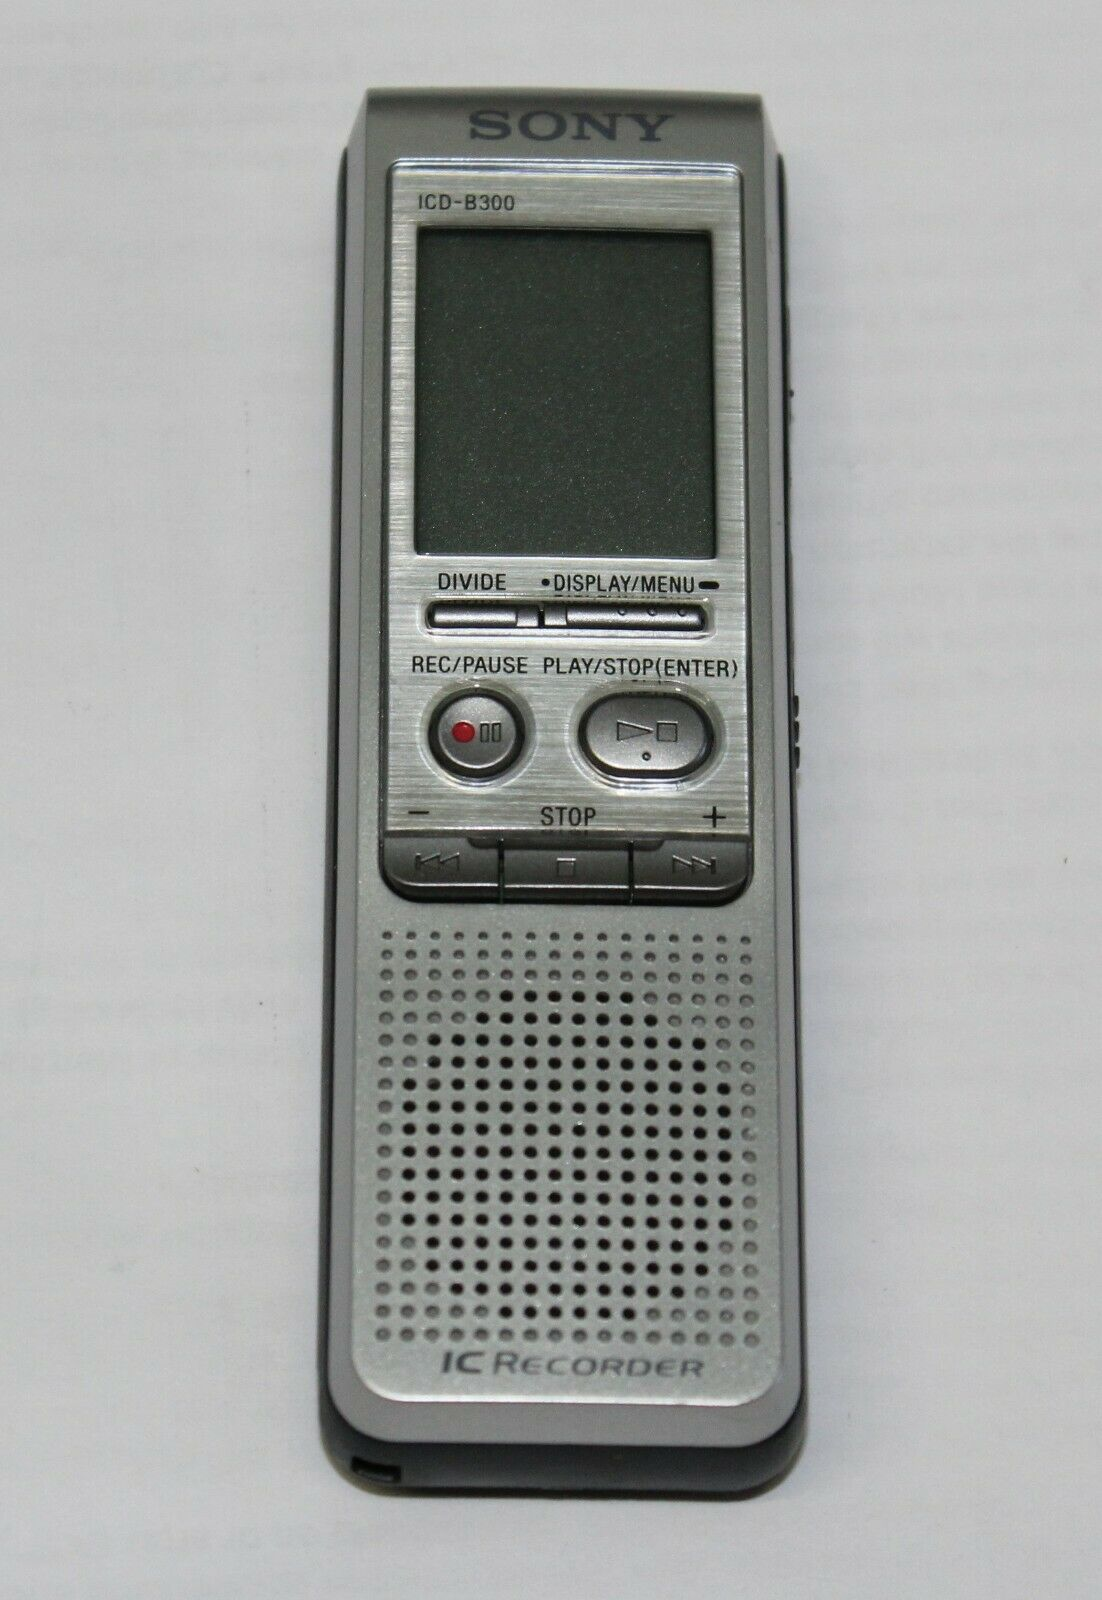 Sony ICD-B300 Digital Voice Recorder